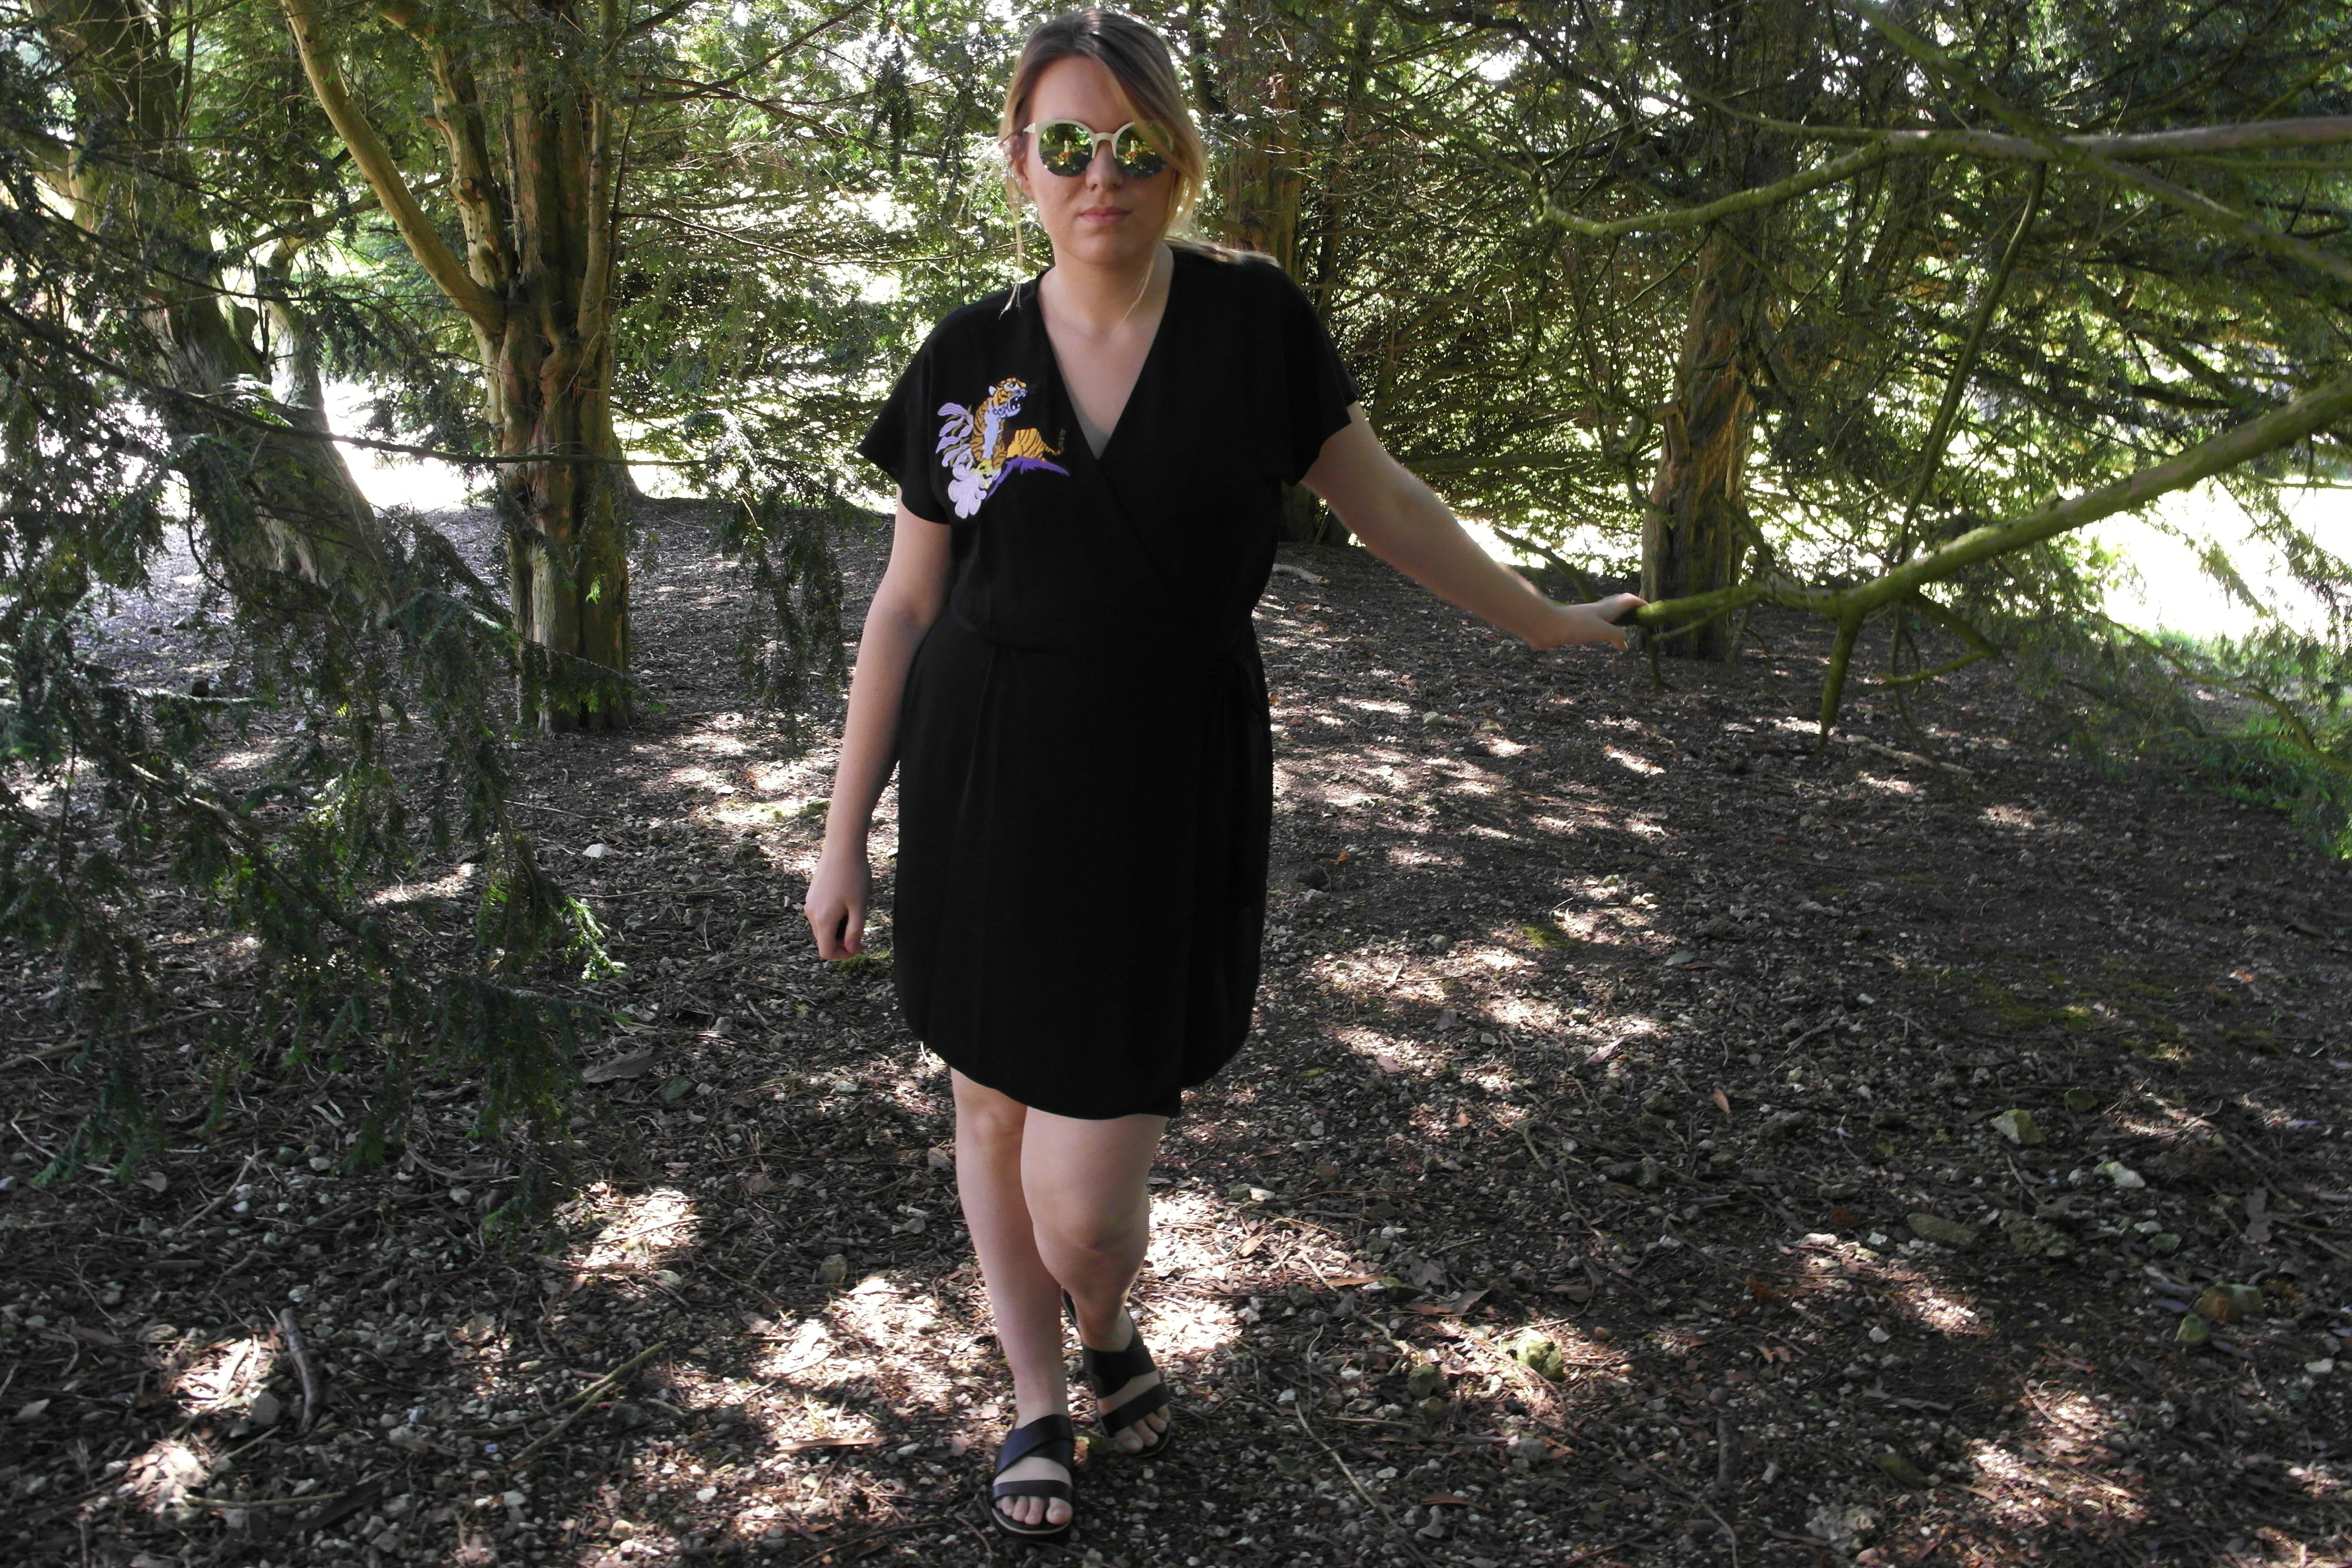 Wrap Dress, Violet Glenton, OOTD, Summer, Summer Fashion